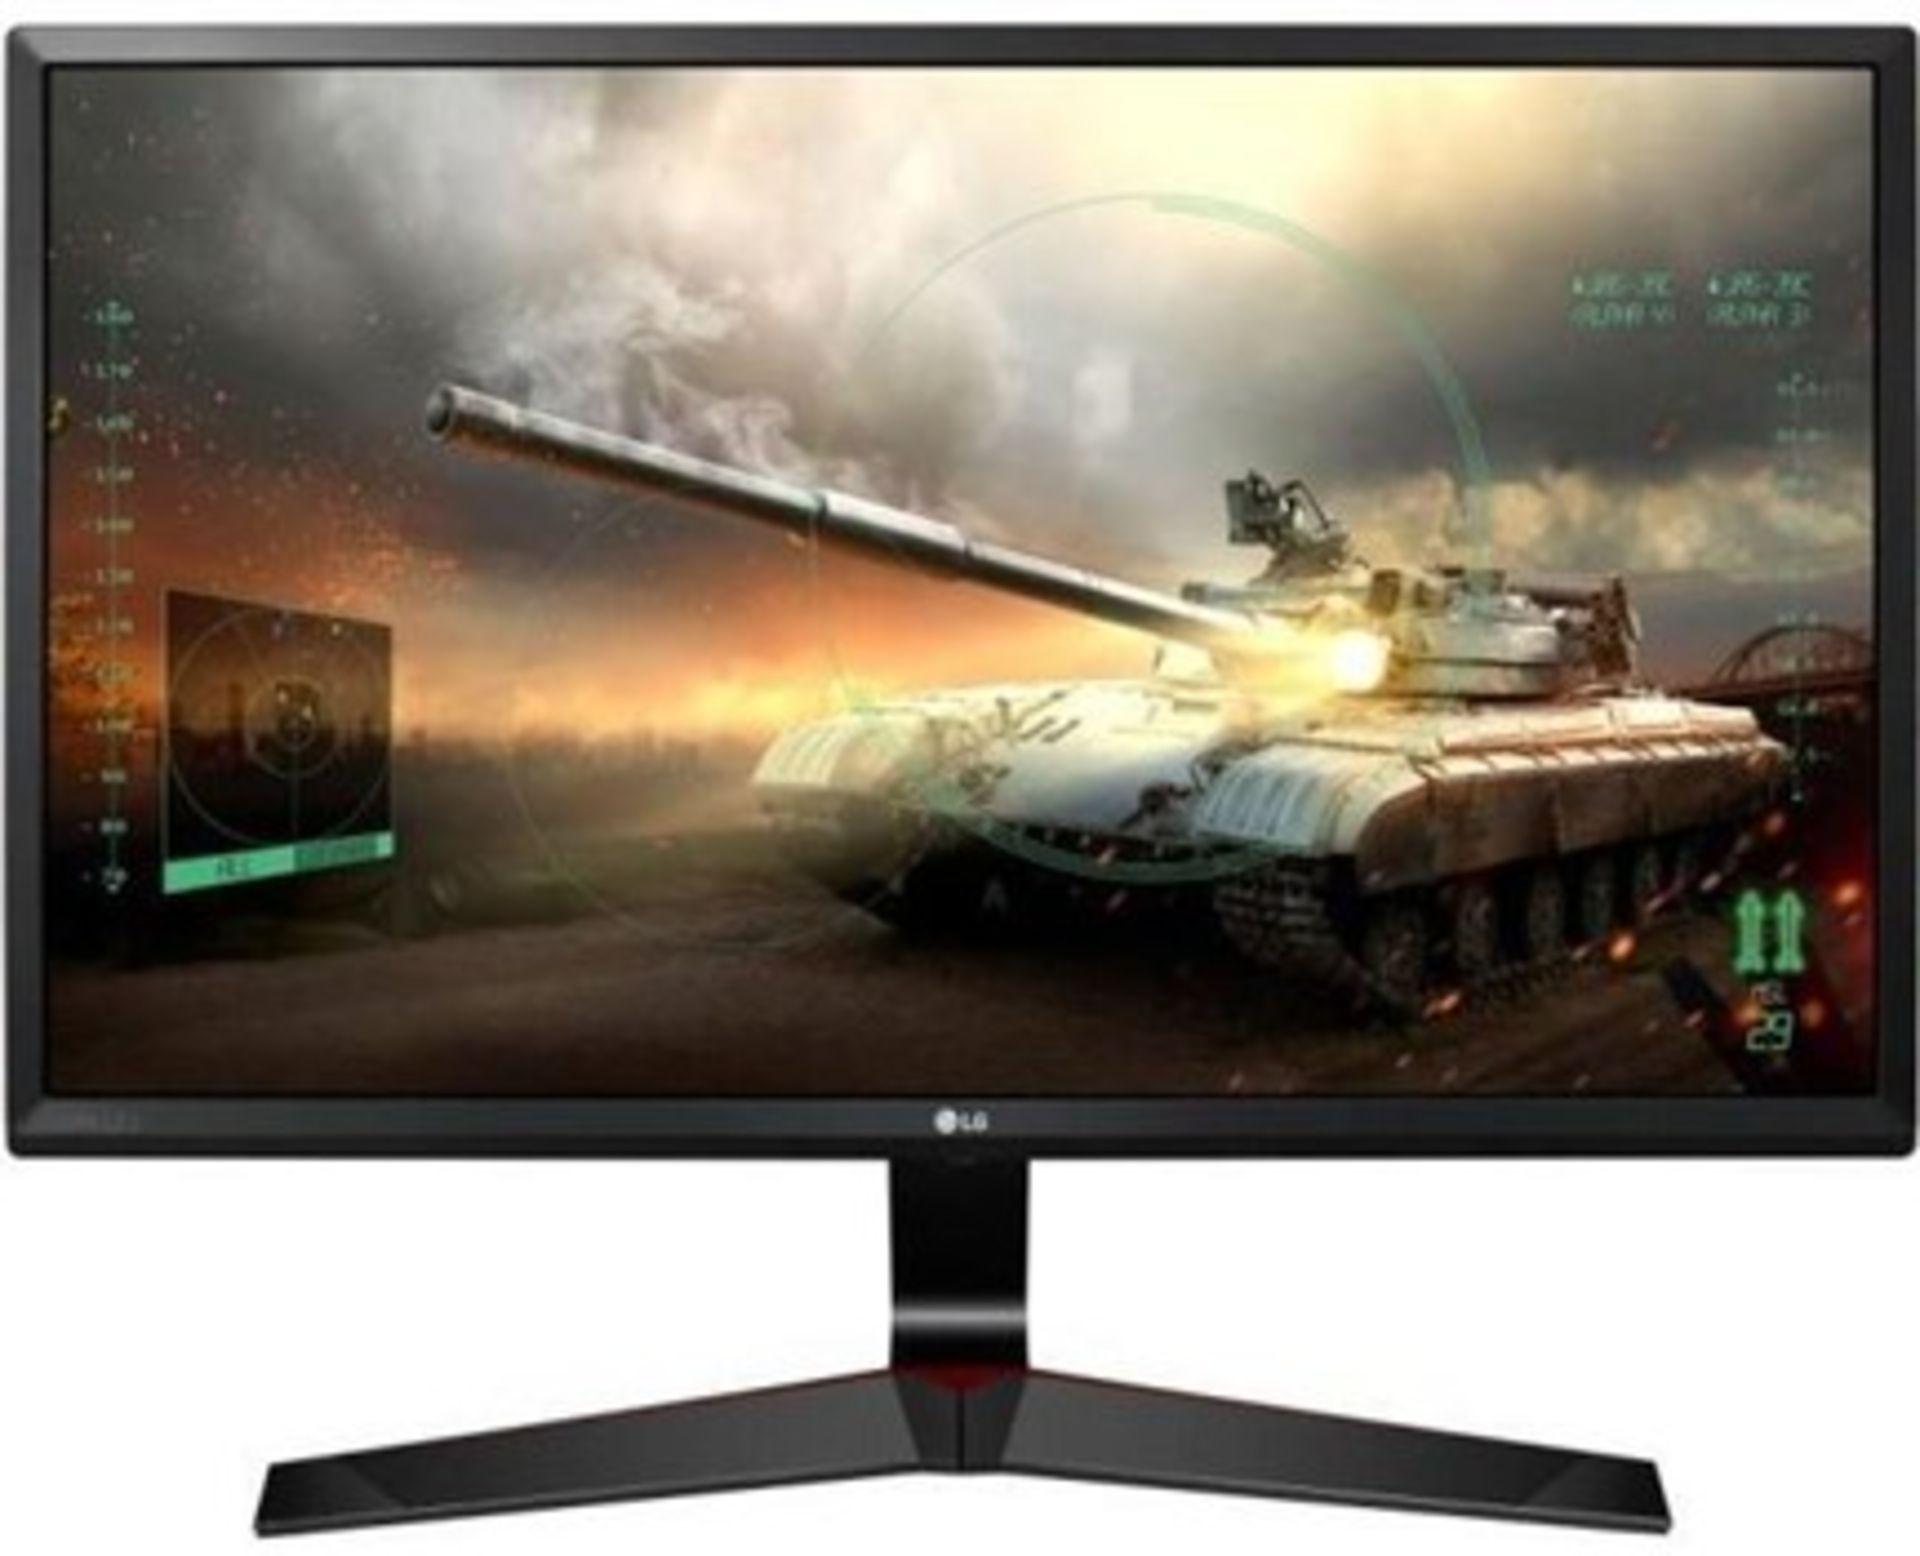 Lot 16028 - V Grade A LG 24 Inch FULL HD IPS LED GAMING MONITOR - D-SUB, HDMI, DISPLAY PORT 24MP59G-P